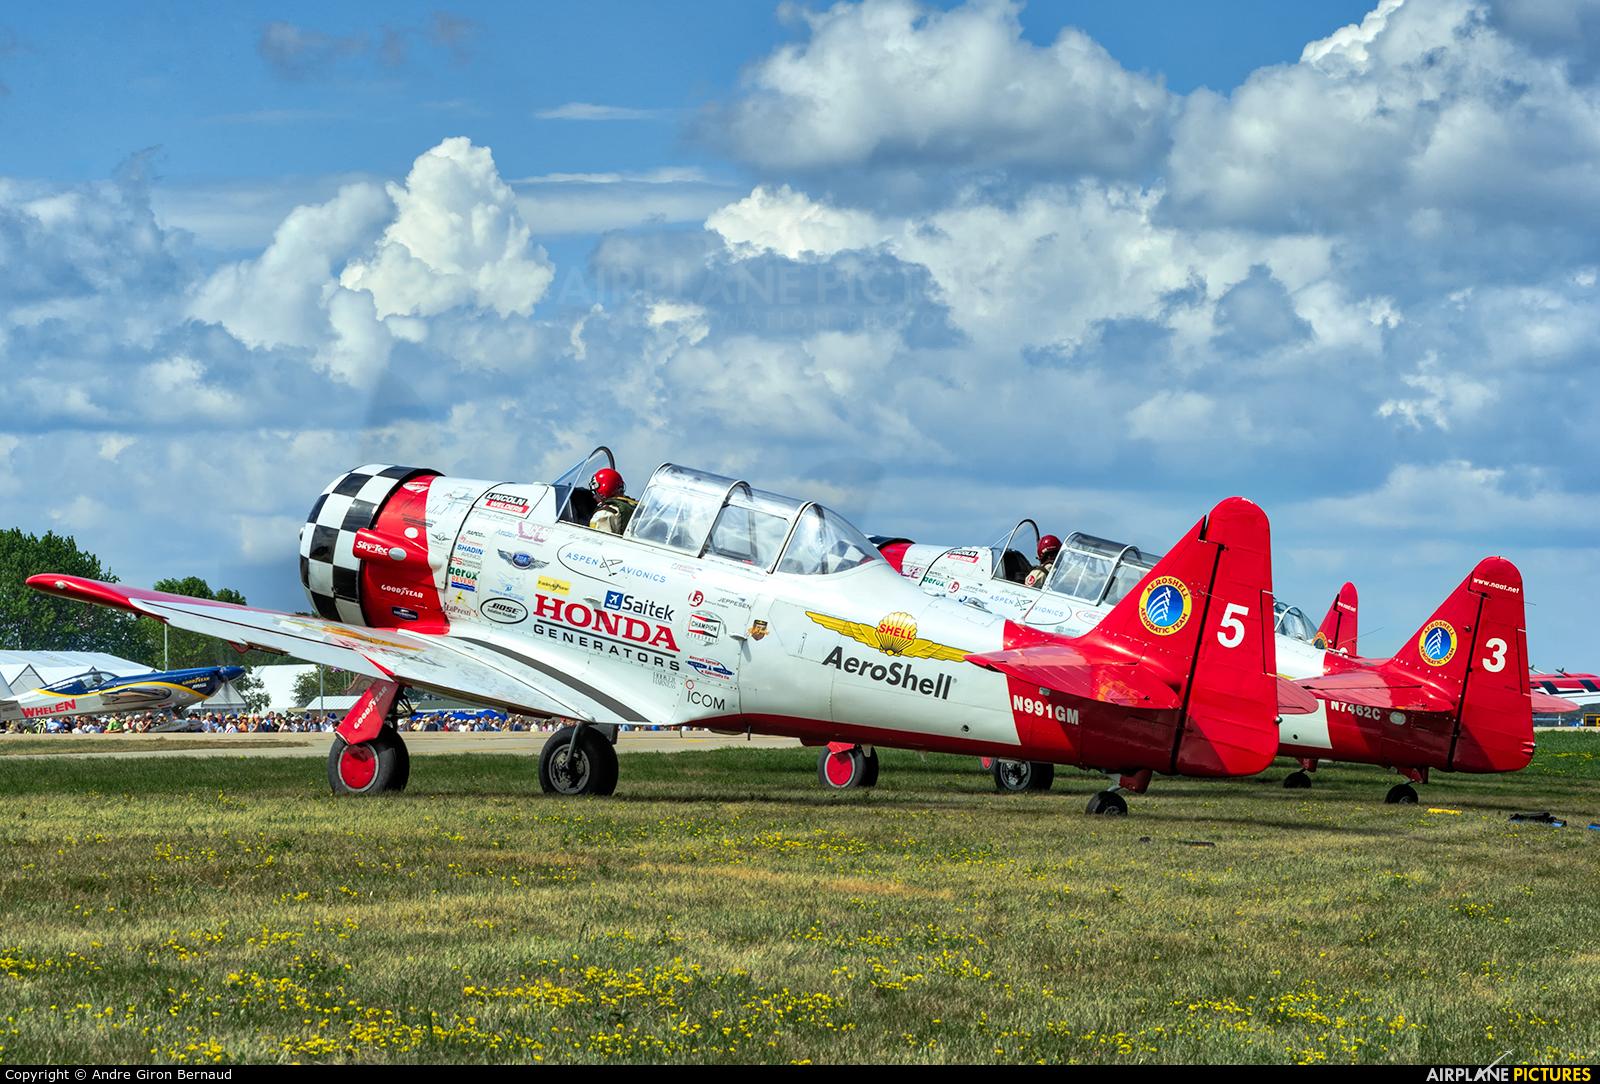 Aeroshell Aerobatic Team N991GM aircraft at Oshkosh - Wittman Regional